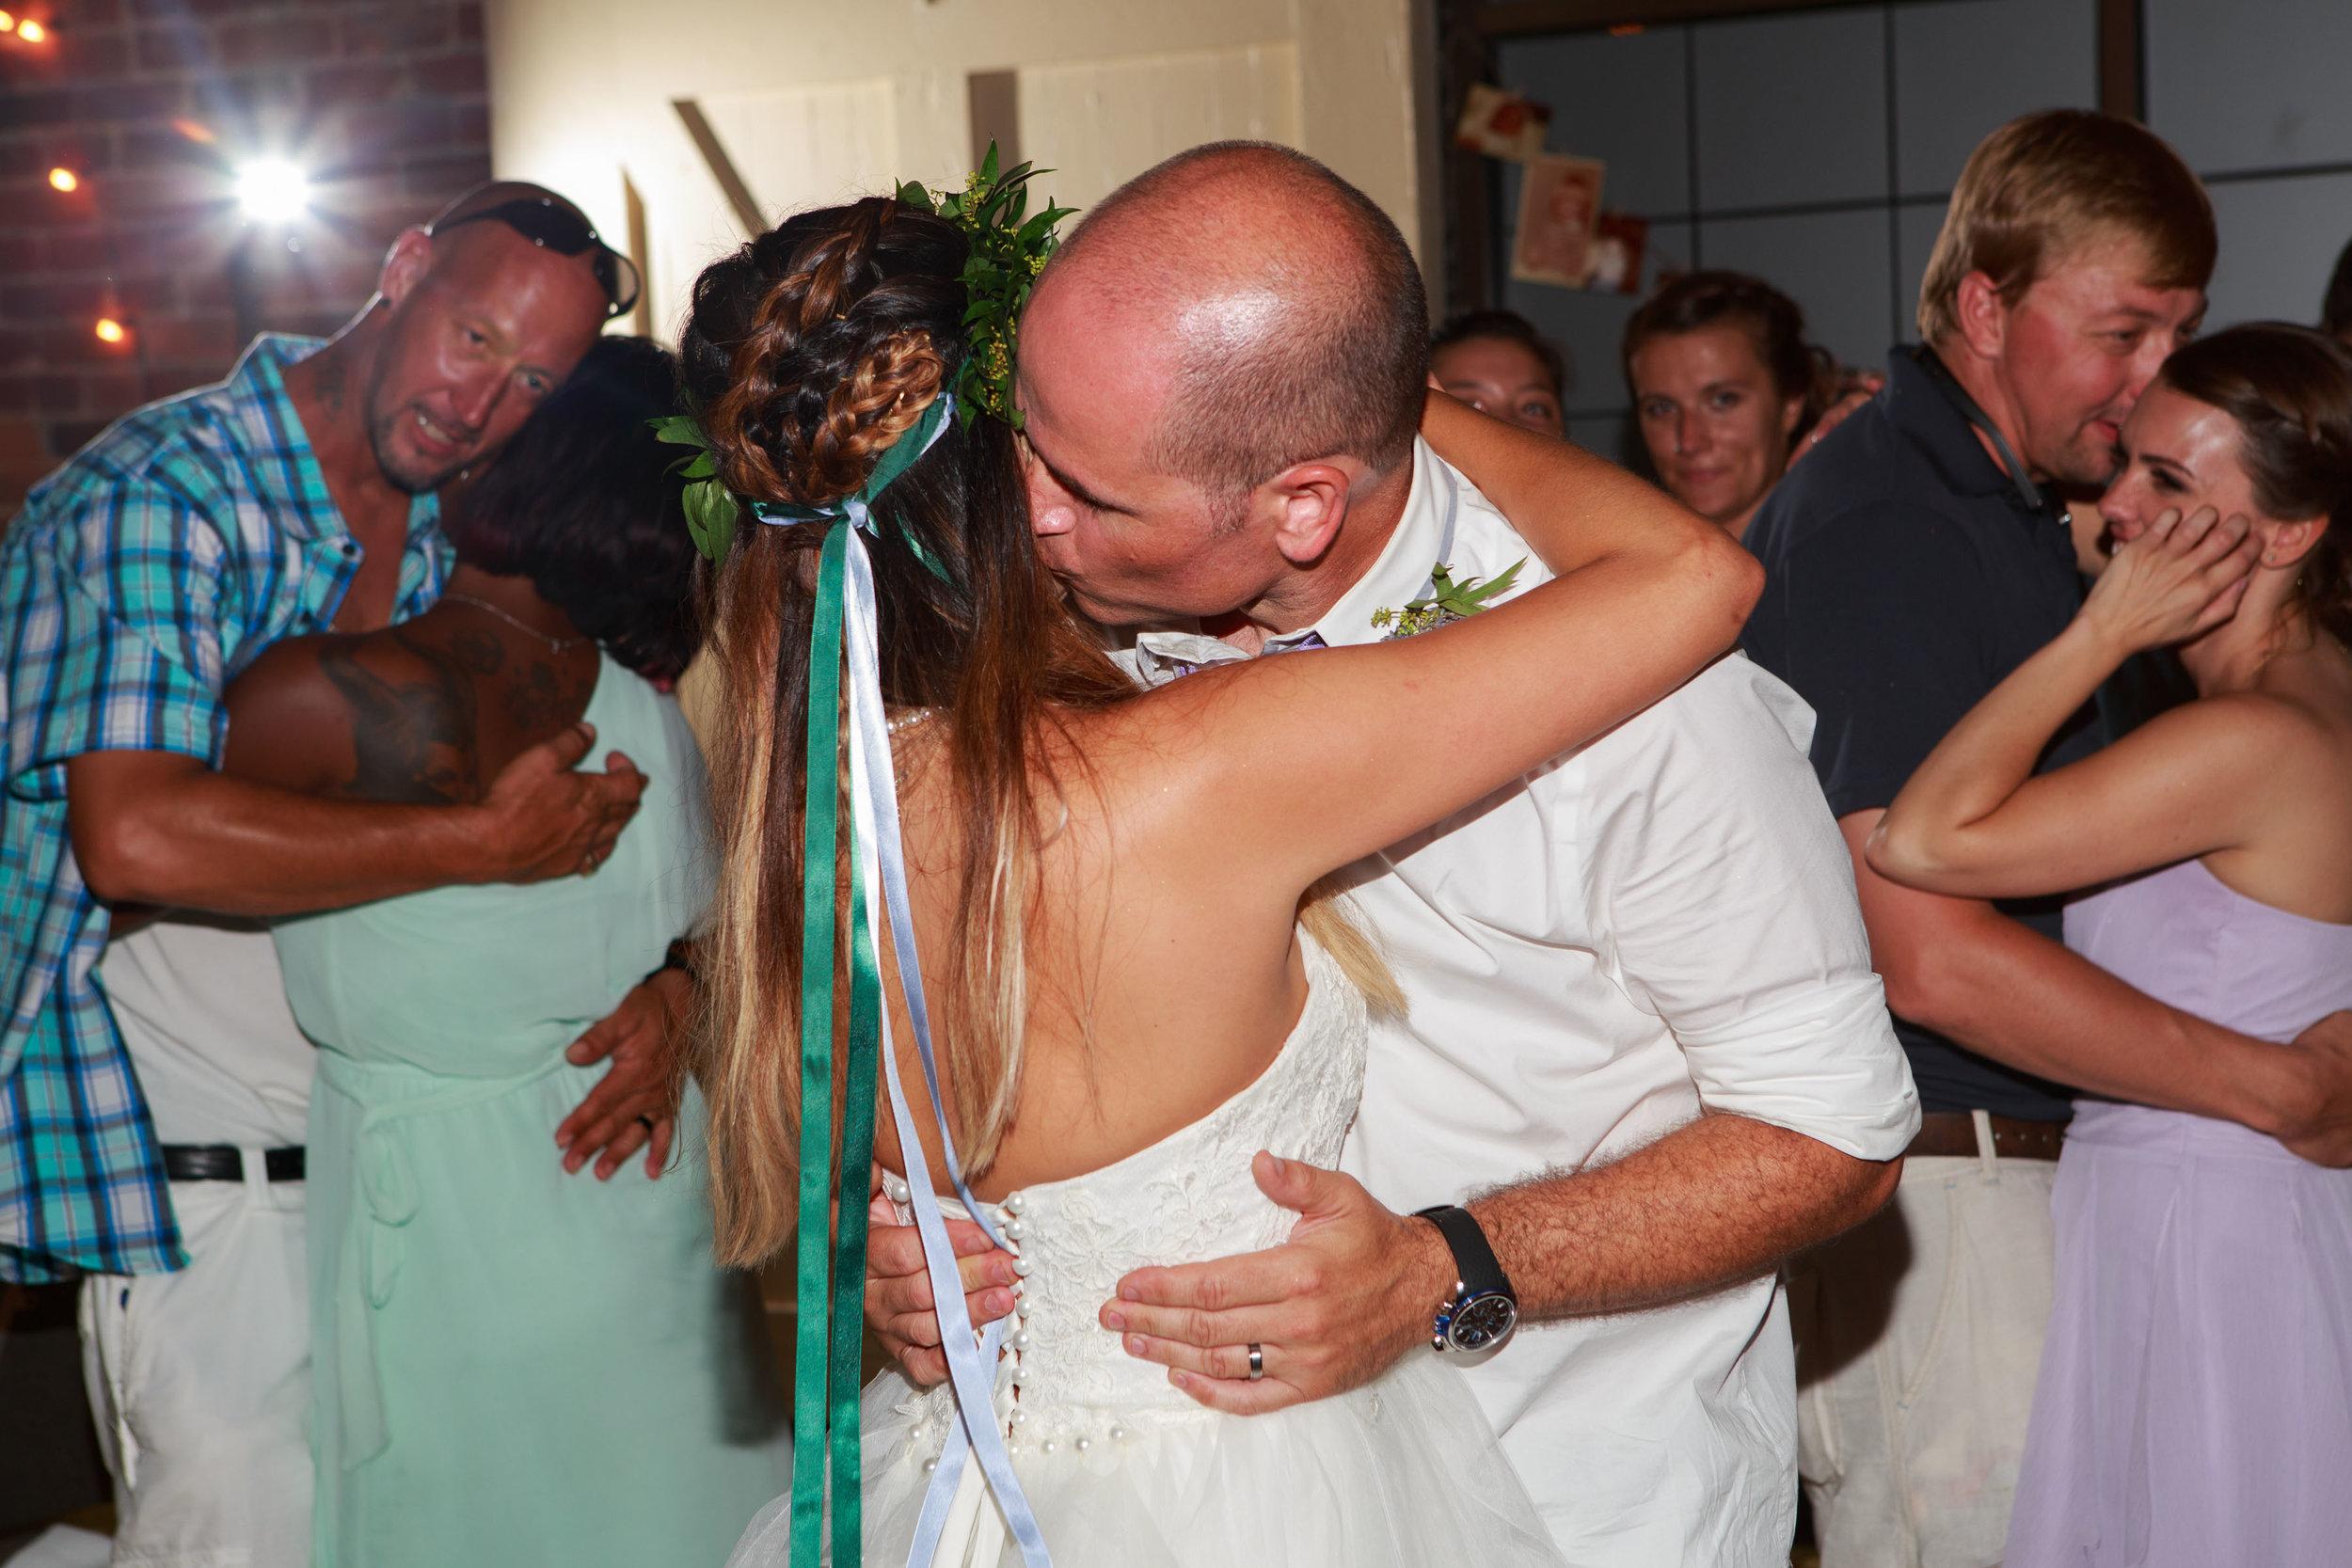 North_Carolina_Wedding_Photographer_Tiffany_Abruzzo_Reception_328.jpg